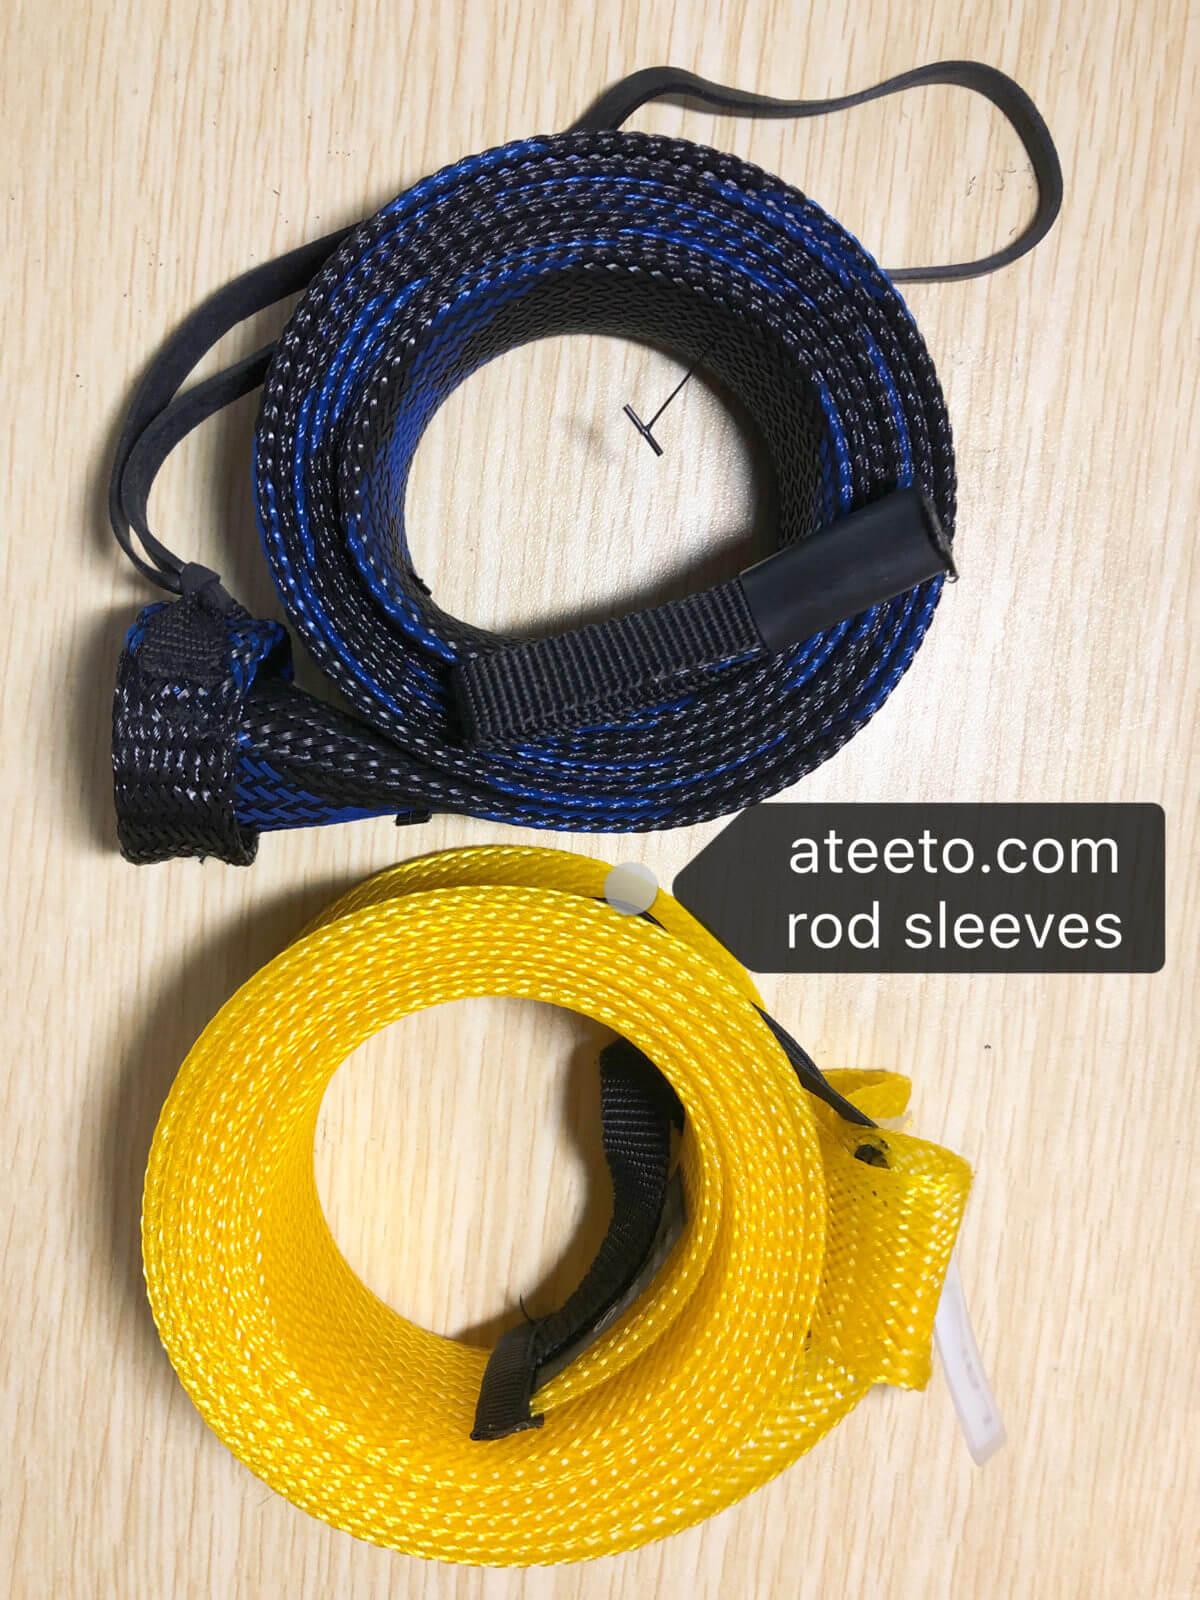 fishing rod sleeves for sale ateeto manuafacturer